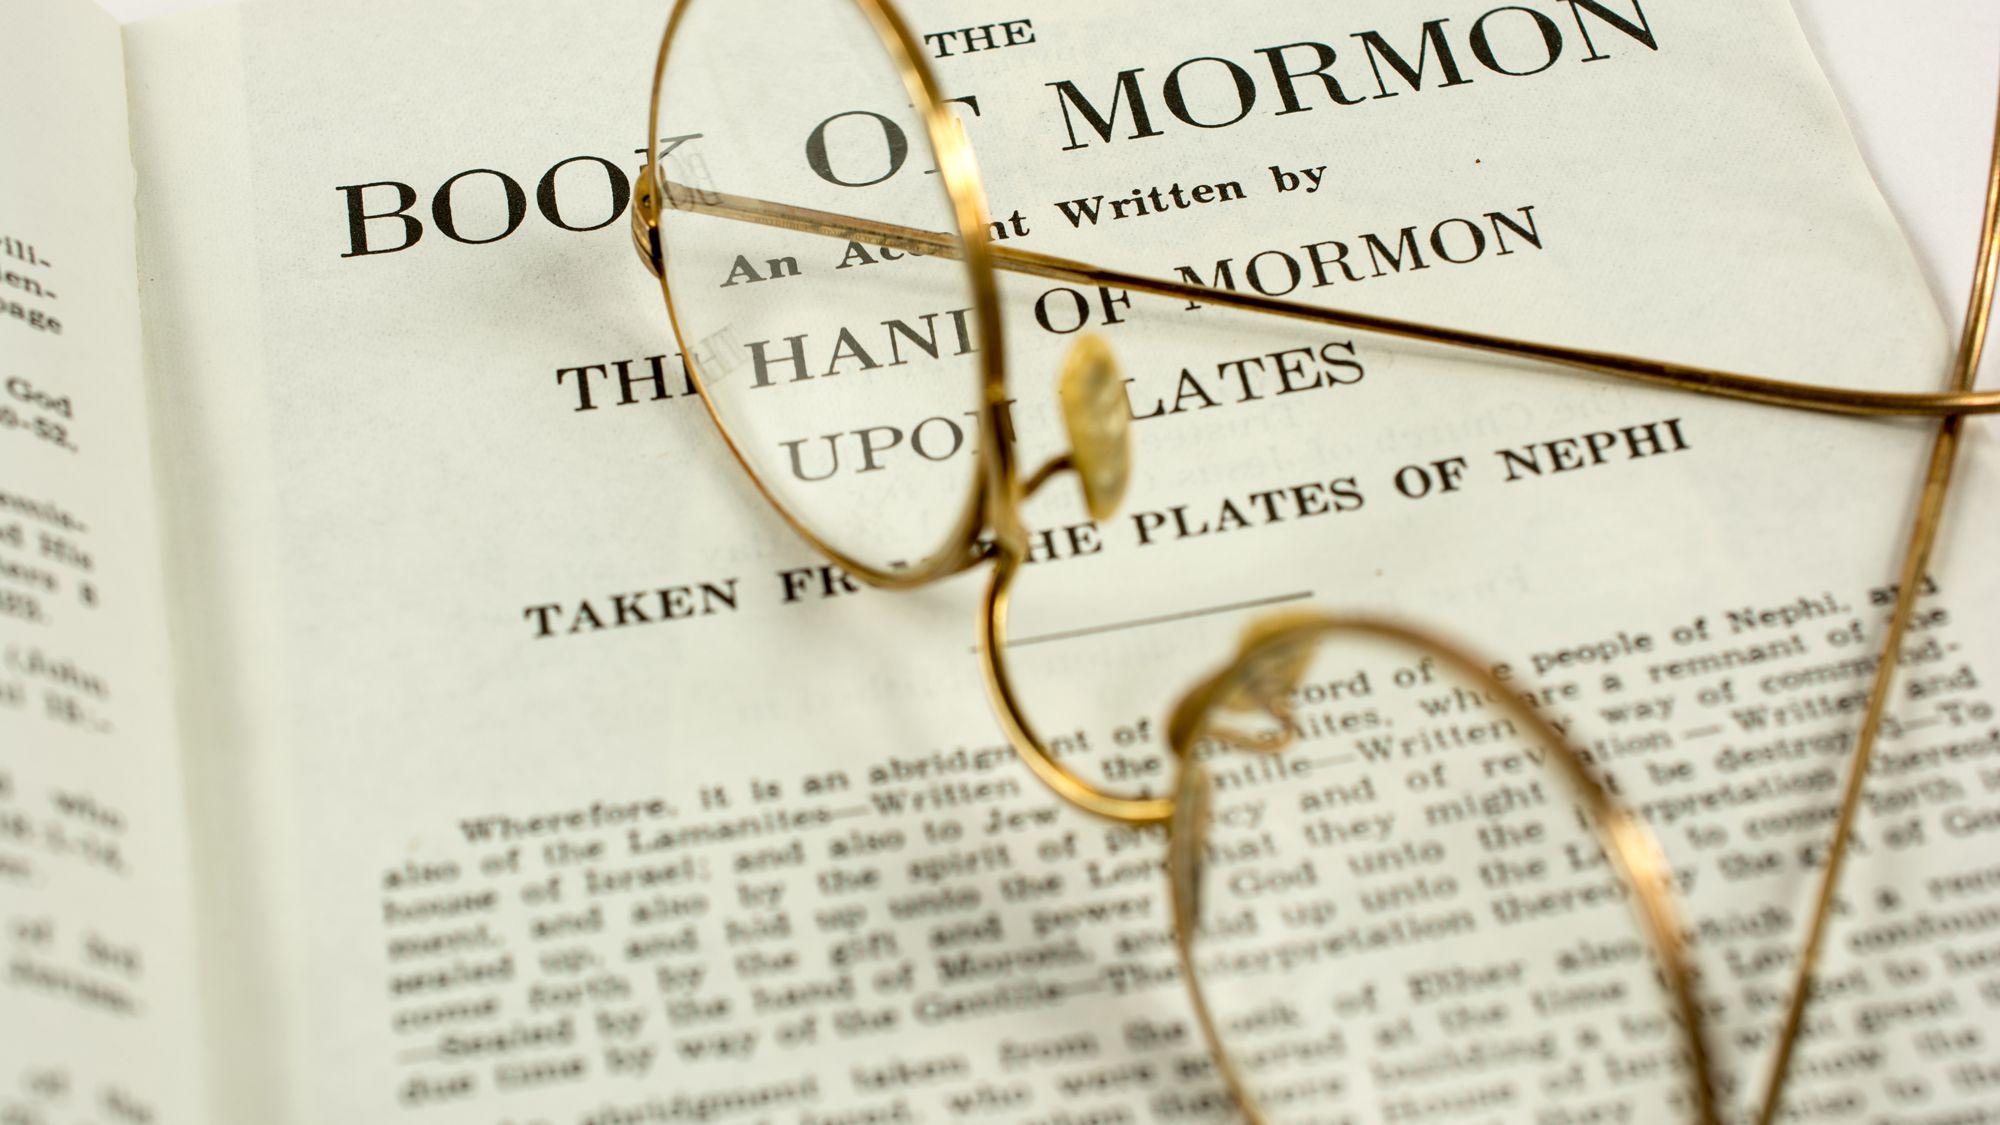 25 Scripture Mastery Scriptures: Book of Mormon (1-13)